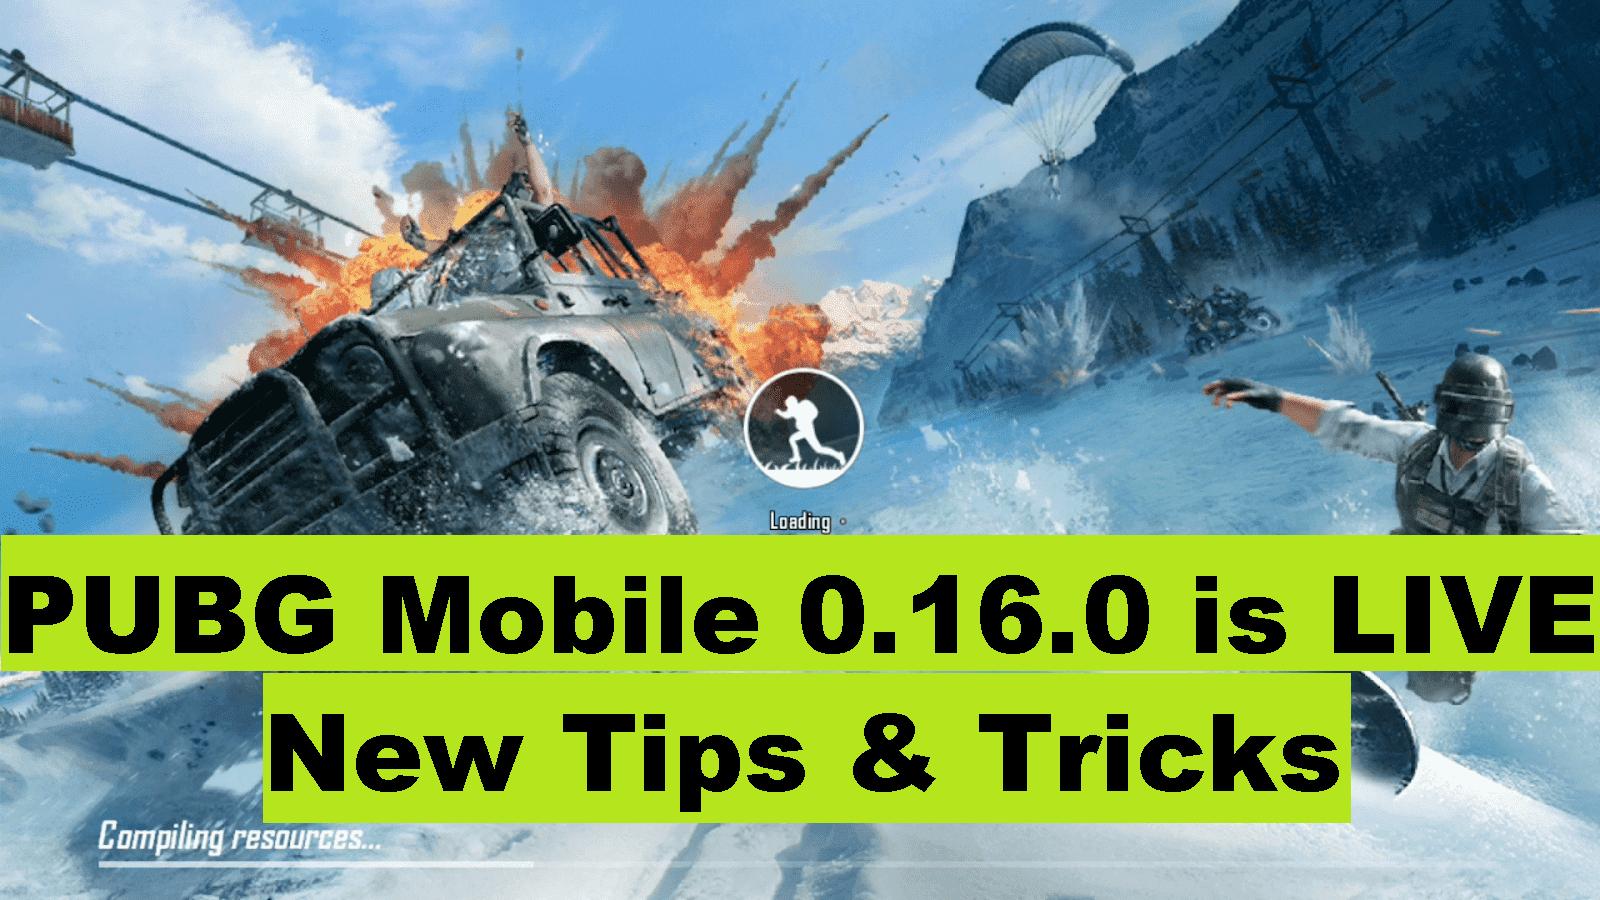 PUBG Mobile 0.16.0 tips